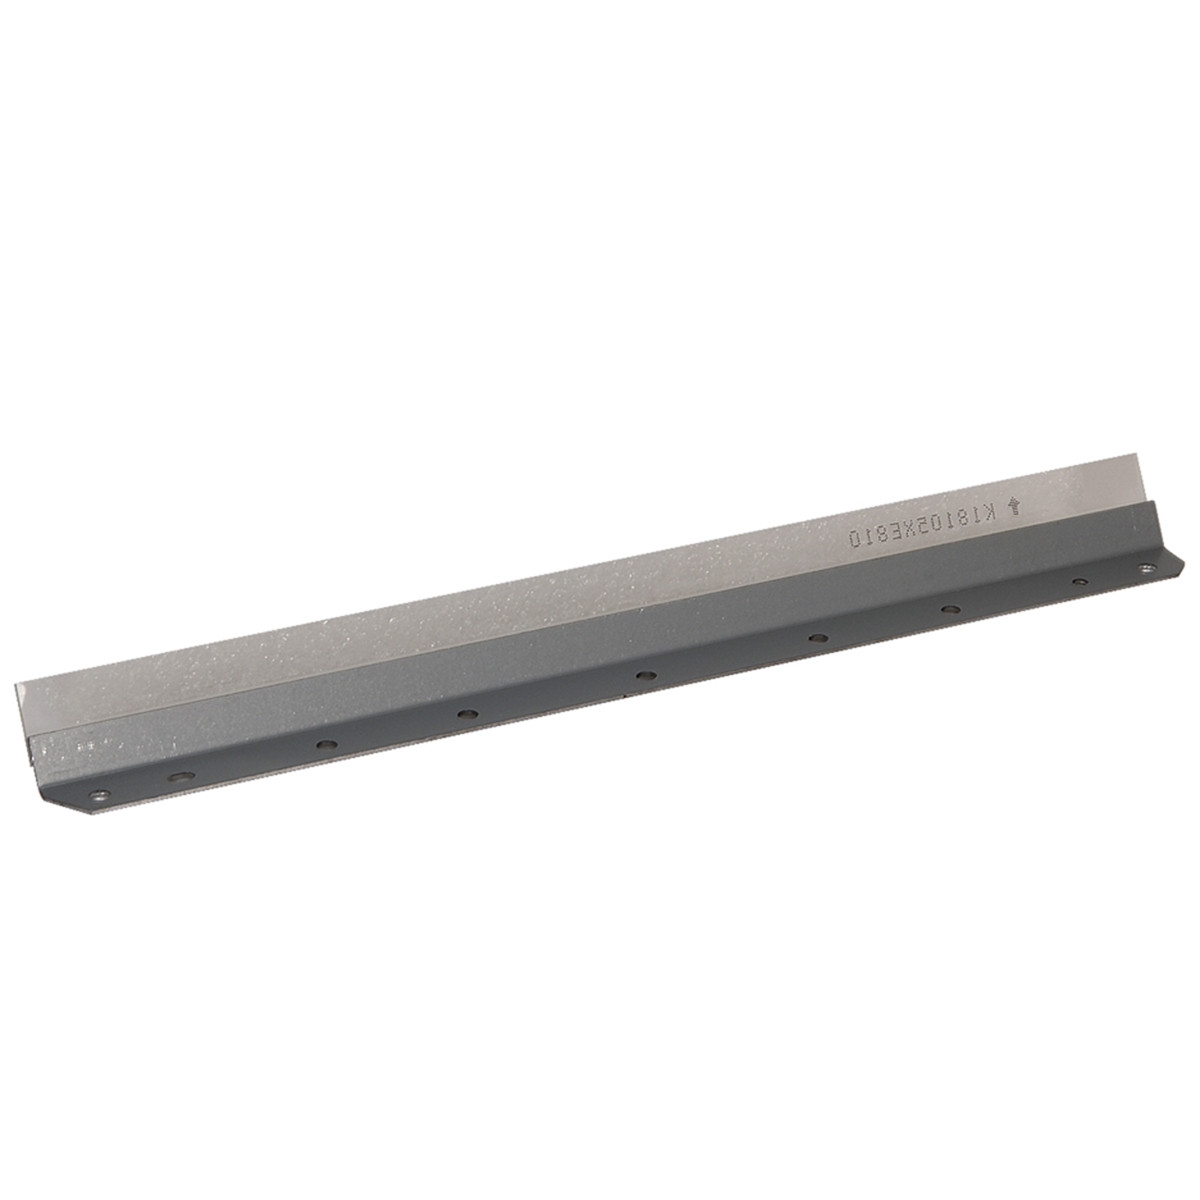 Lâmina de Limpeza Cilindro Xerox XD 100 | XD 105 | XL 2120 | XD 2130 | Katun Performance